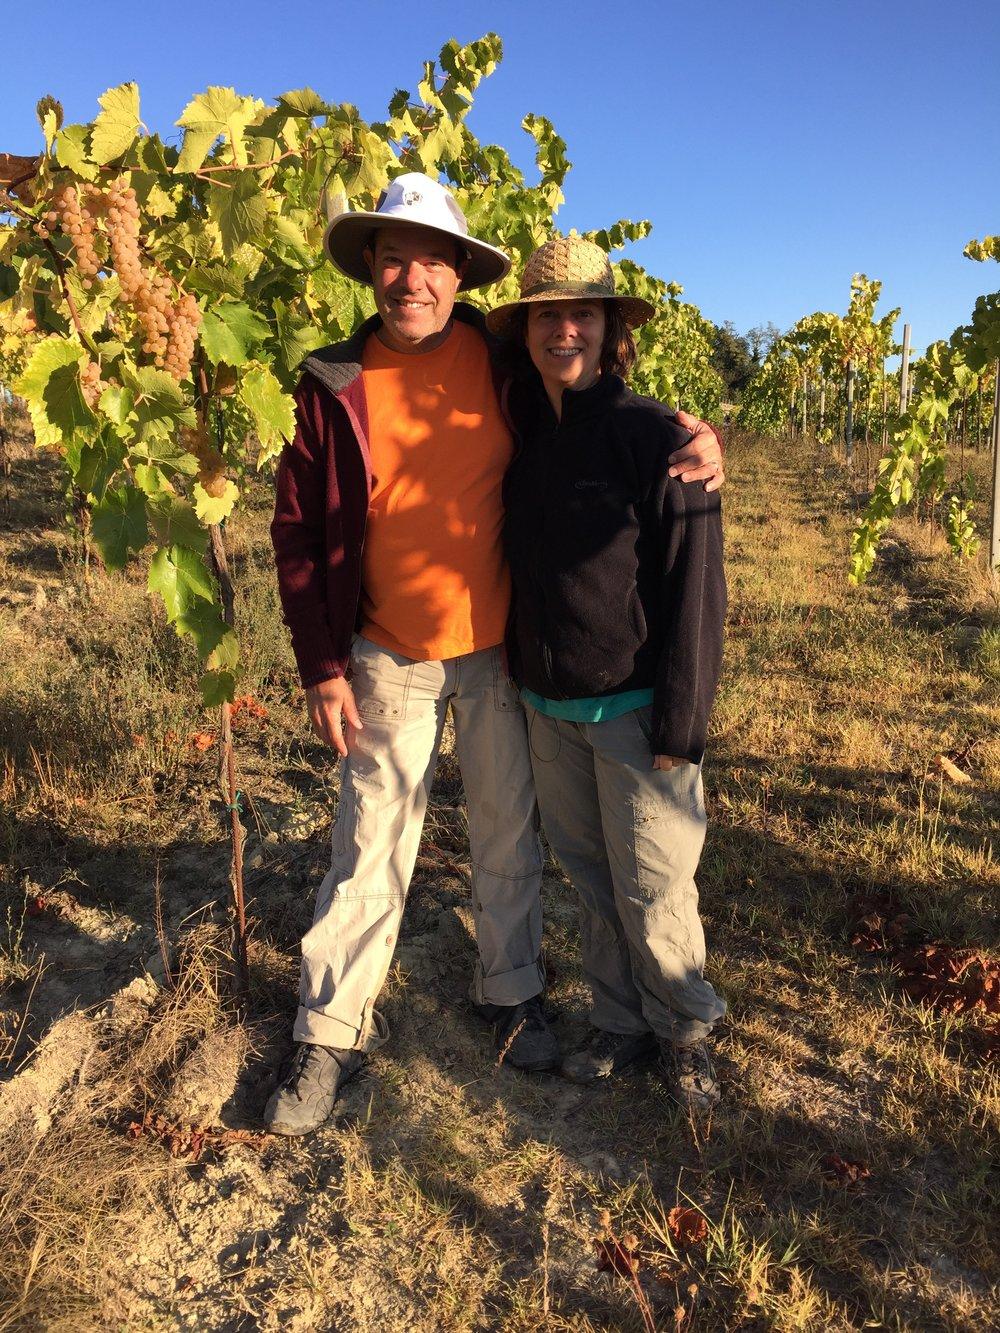 Picking grapes in Dogliani